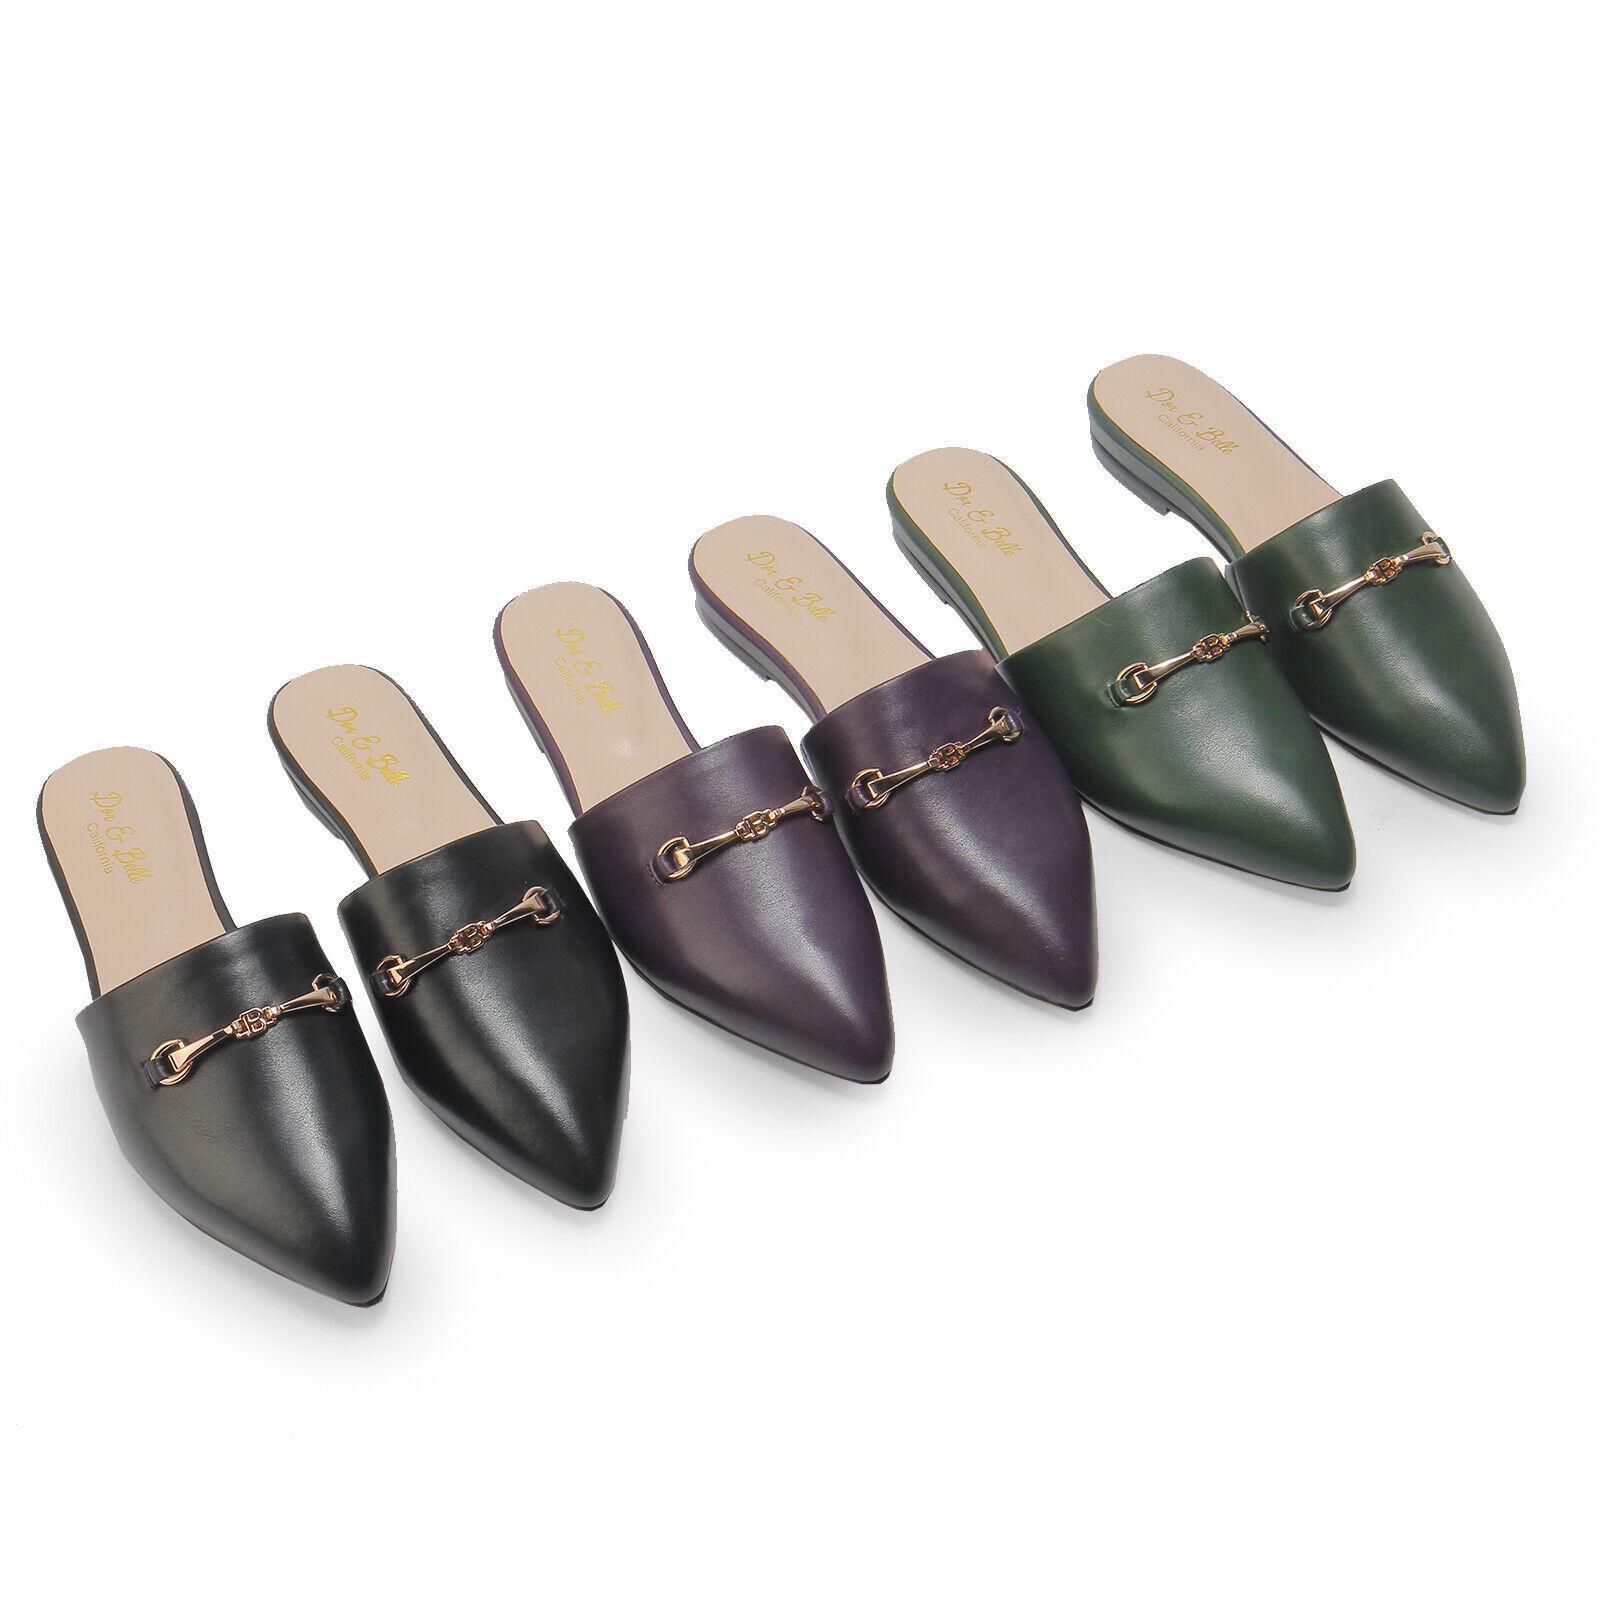 Dor & Belle Belle Original Lamb Skin Leather Flat Mule Sandal Slippers Shoes